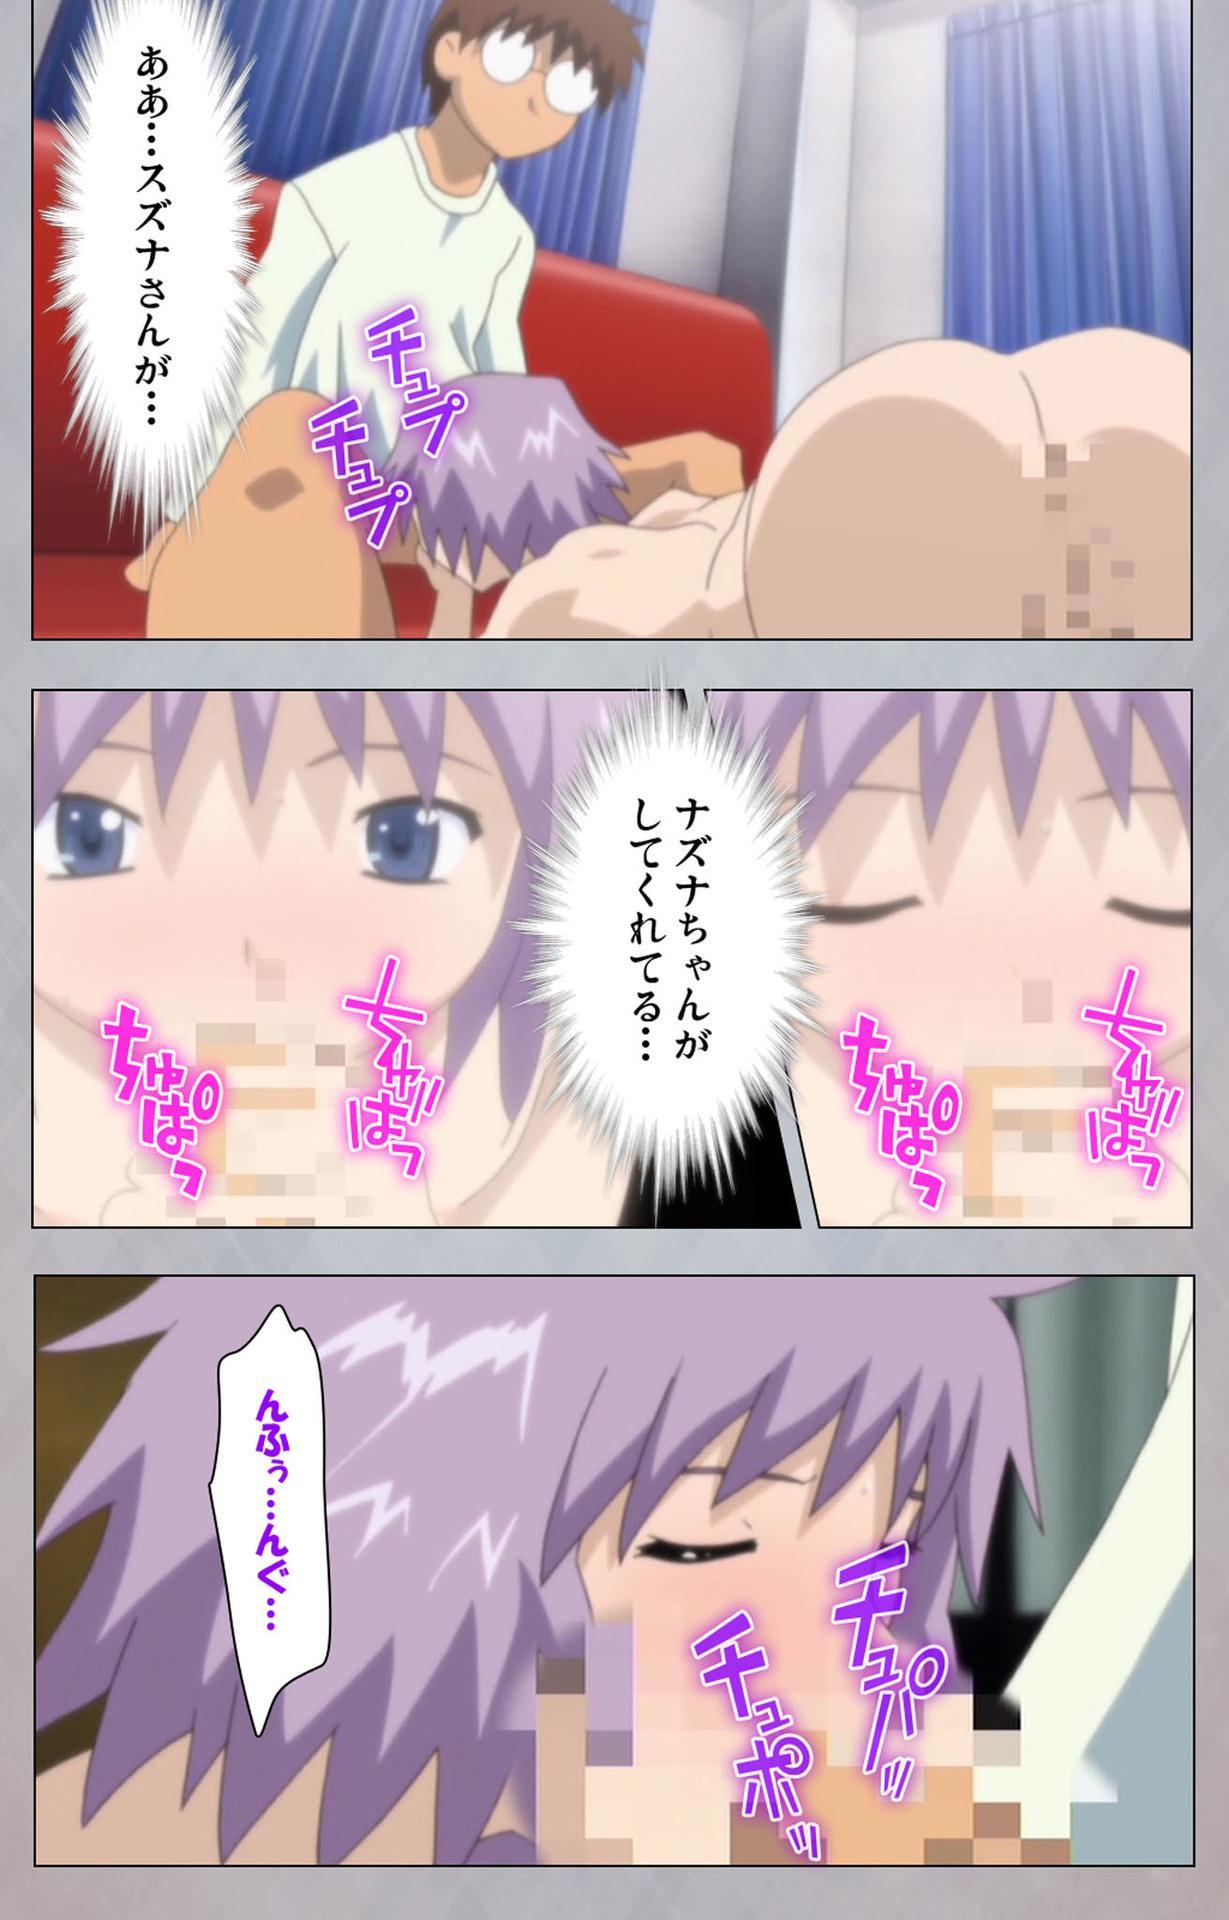 [Digital Works] [Full Color Seijin Ban] Sex Android ~Risou no Onna de Nuite yaru~ Kanzenban 223